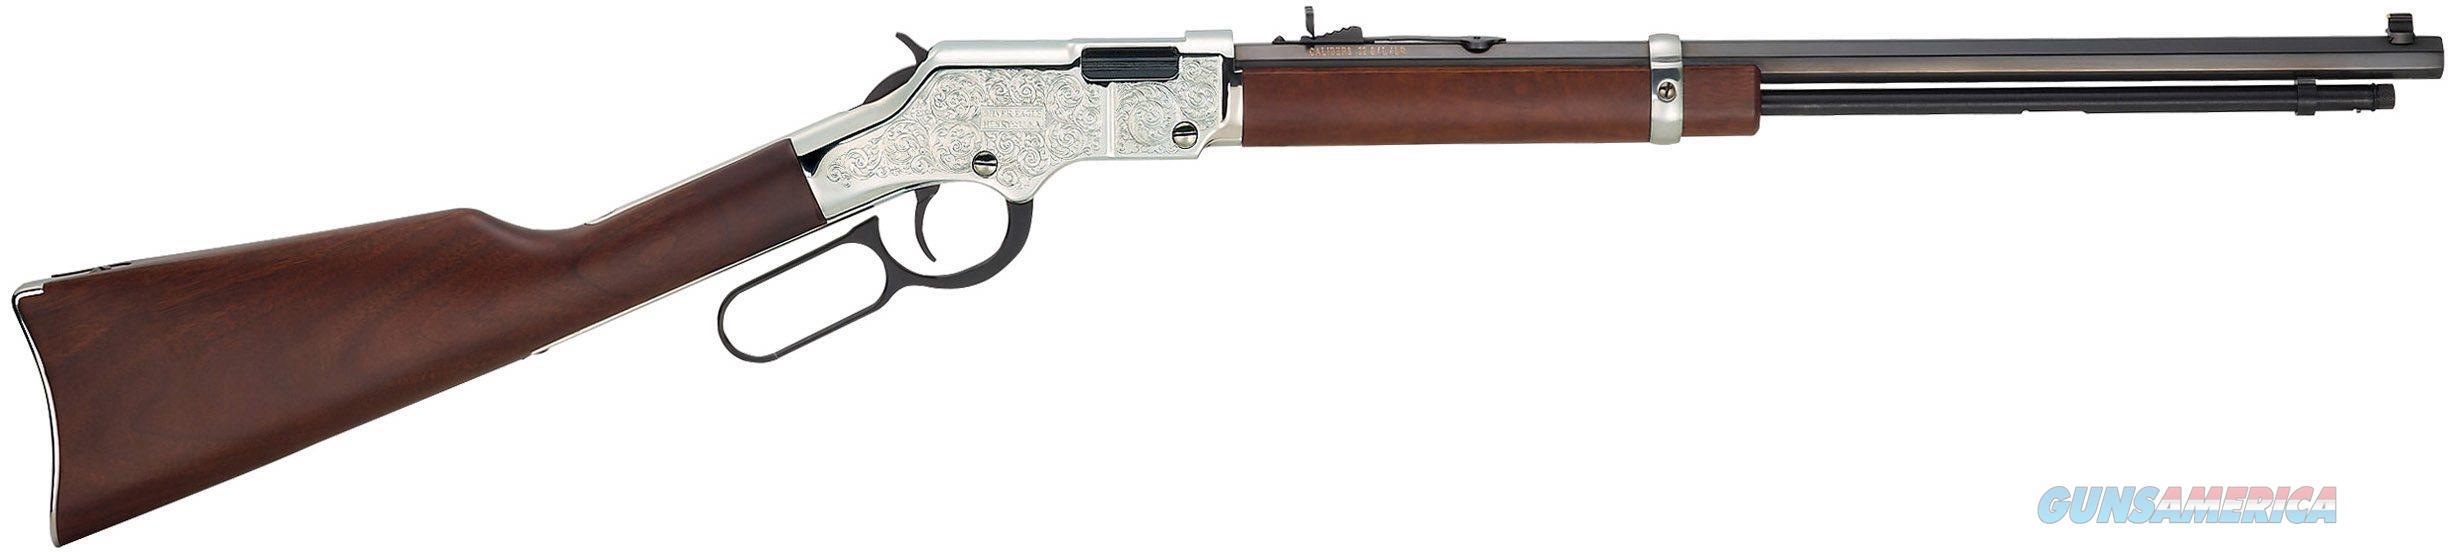 Henry Silver Eagle, .17 HMR, NIB  Guns > Rifles > Henry Rifle Company